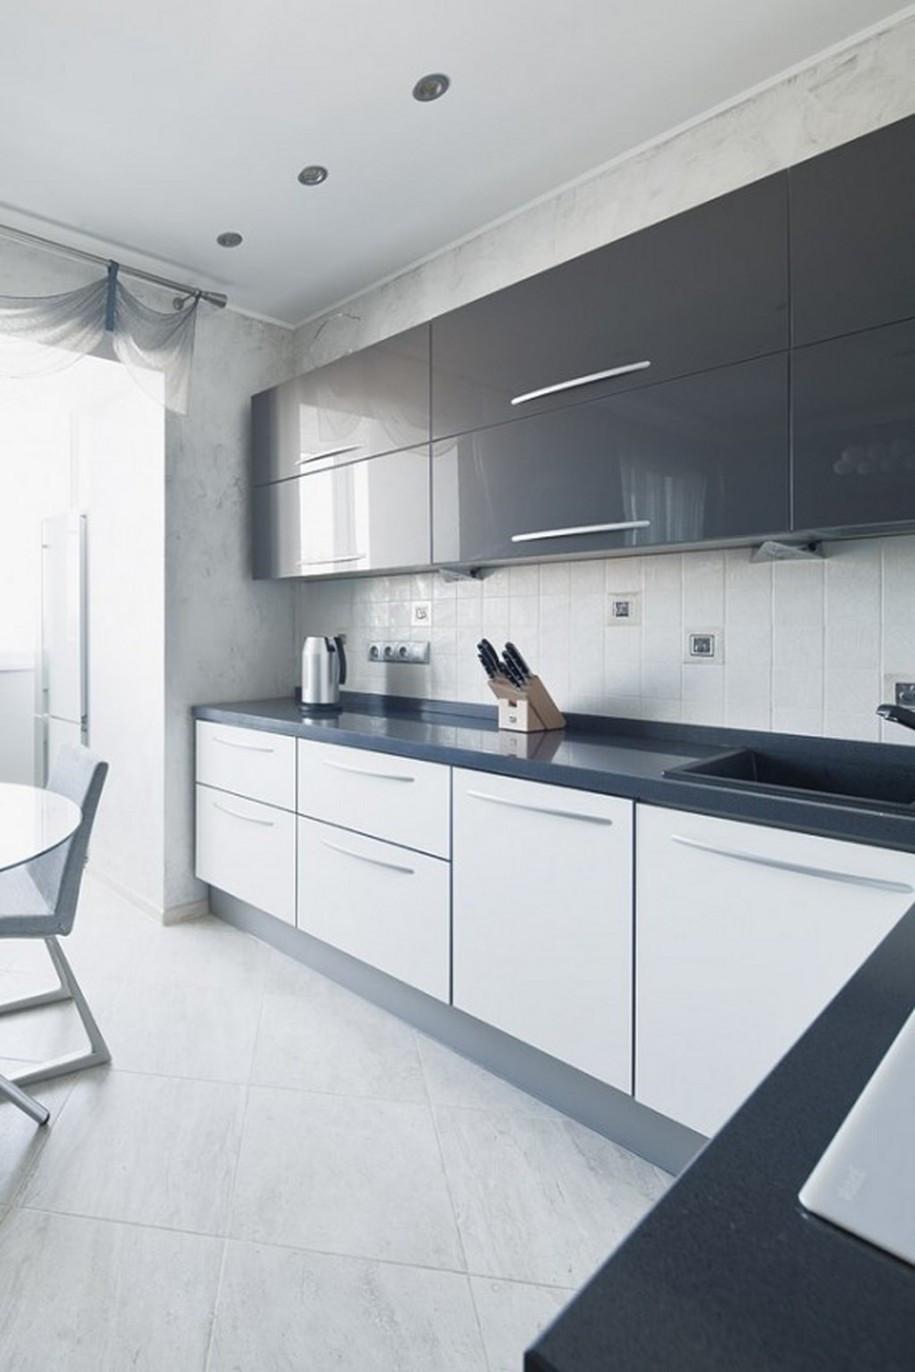 18 Lovable Rona Hardwood Flooring Prices Unique Flooring Ideas